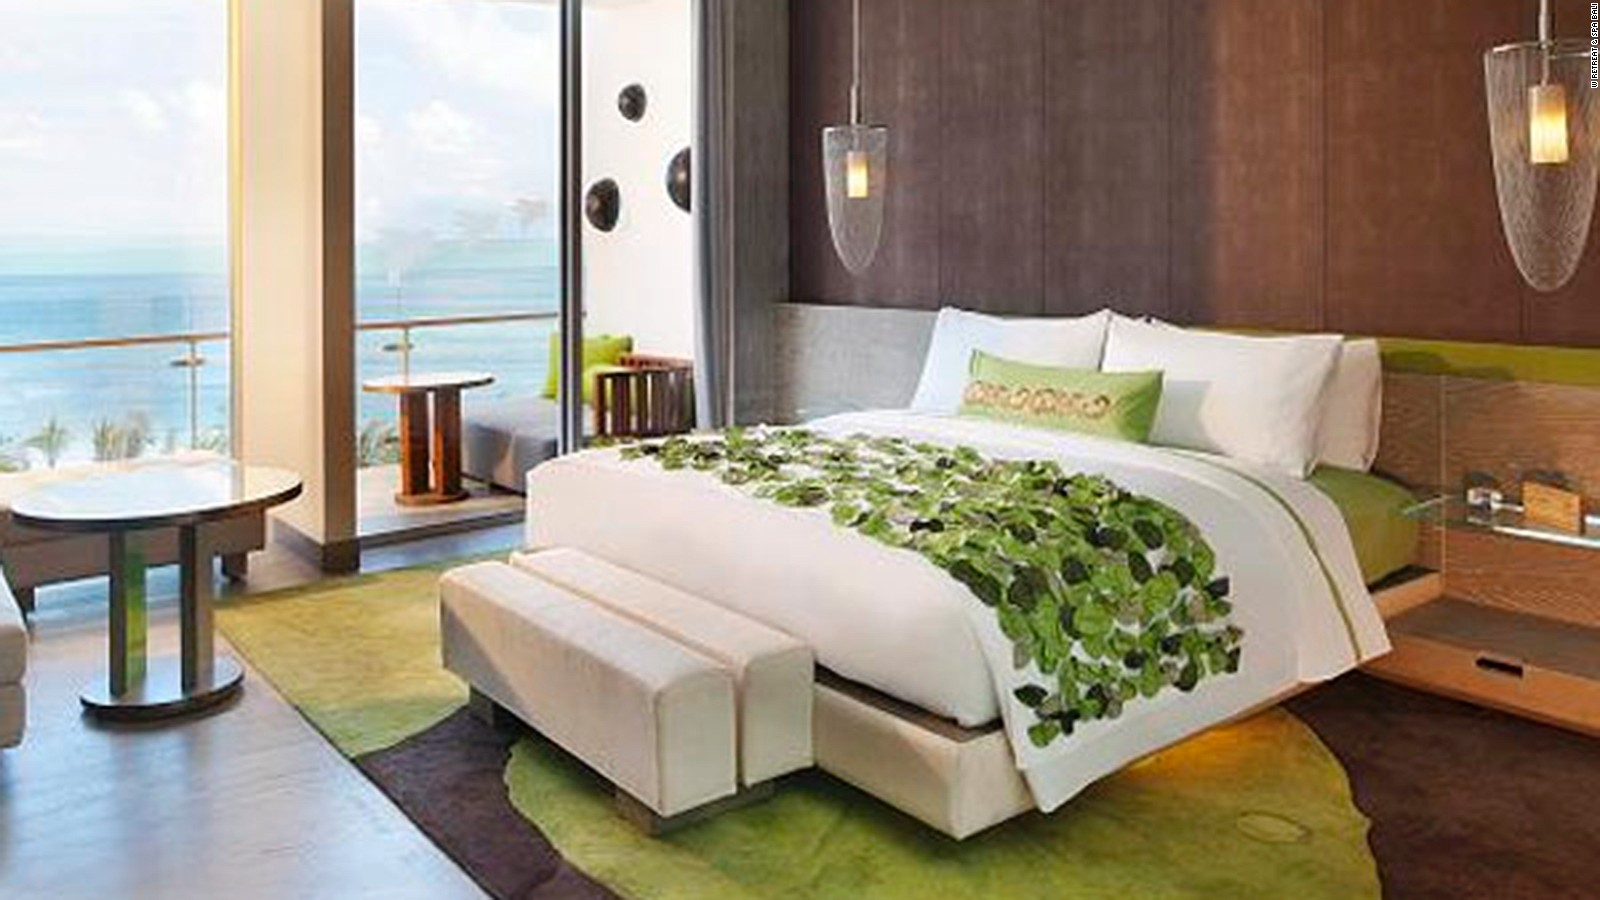 Bali Hotels A Dozen Excellent Choices In Paradise Cnn Travel